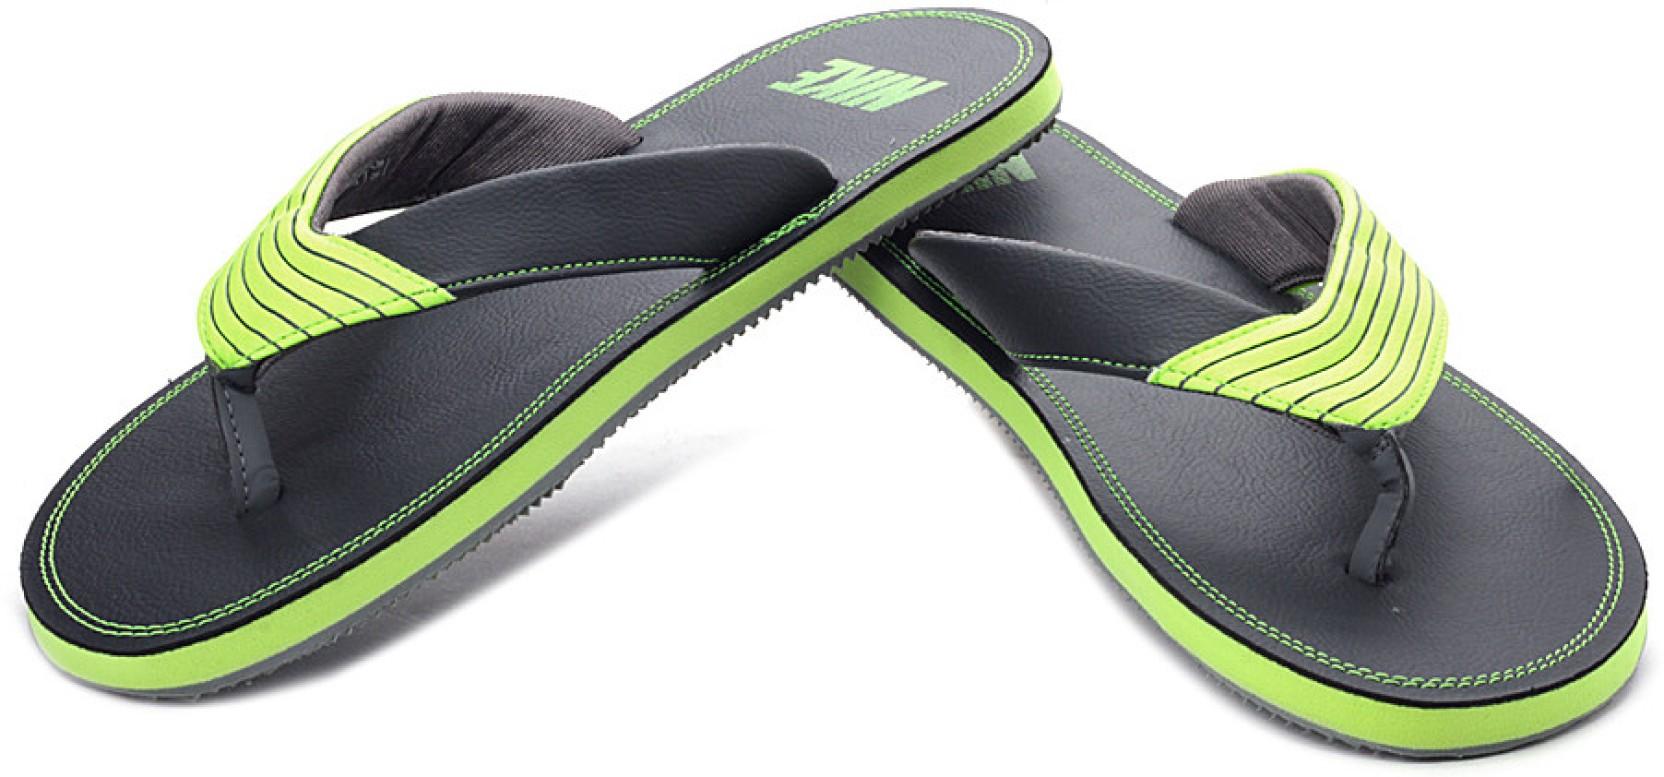 Nike Chroma Flip Flops - Buy Black Color Nike Chroma Flip -5877